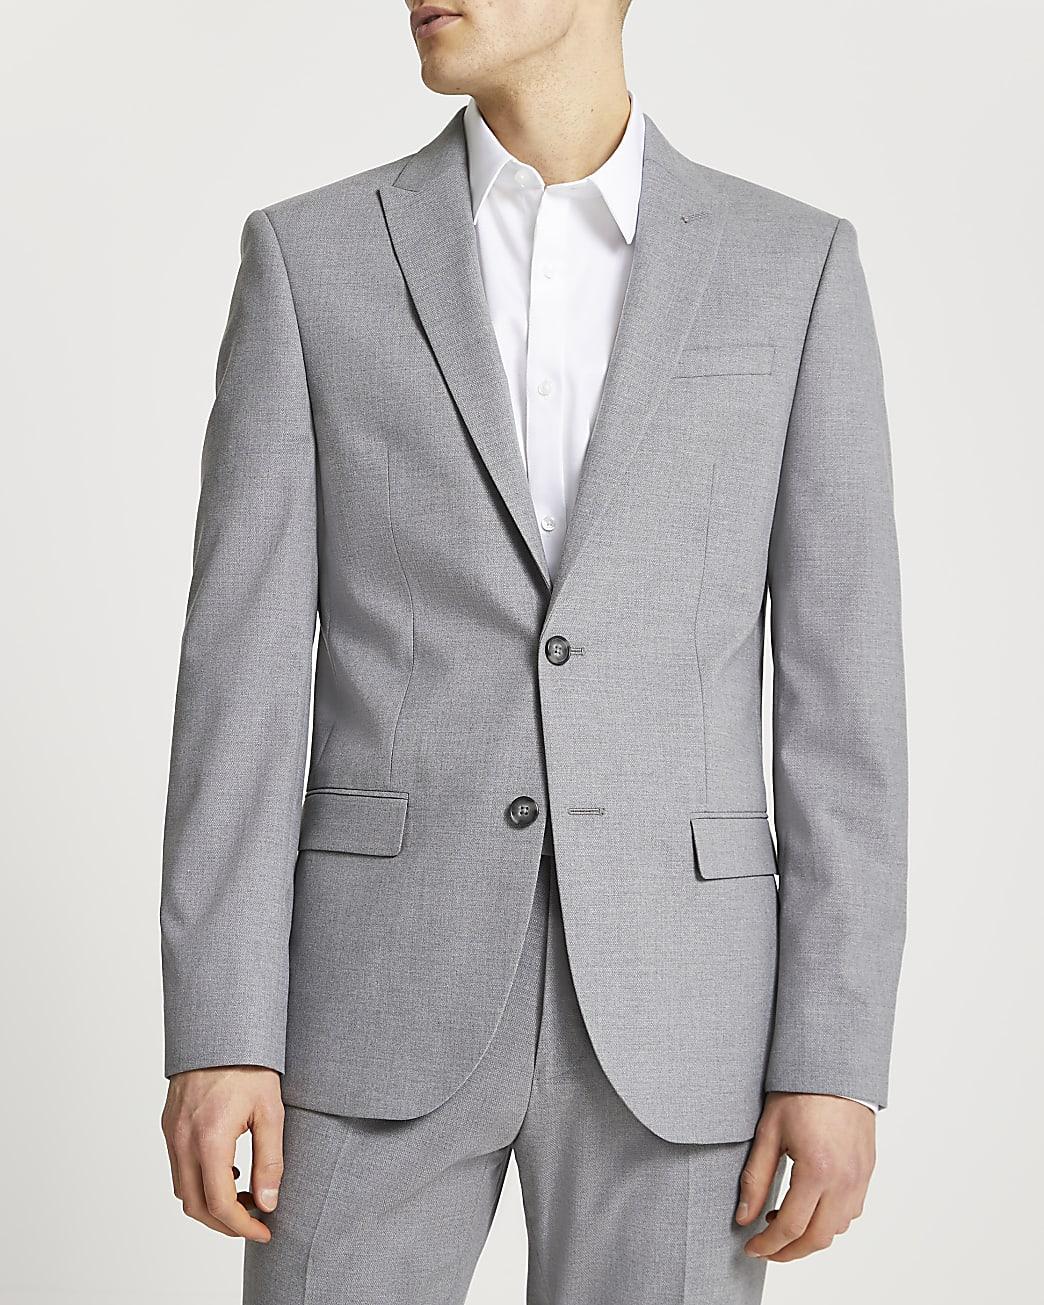 Grey textured slim fit suit jacket